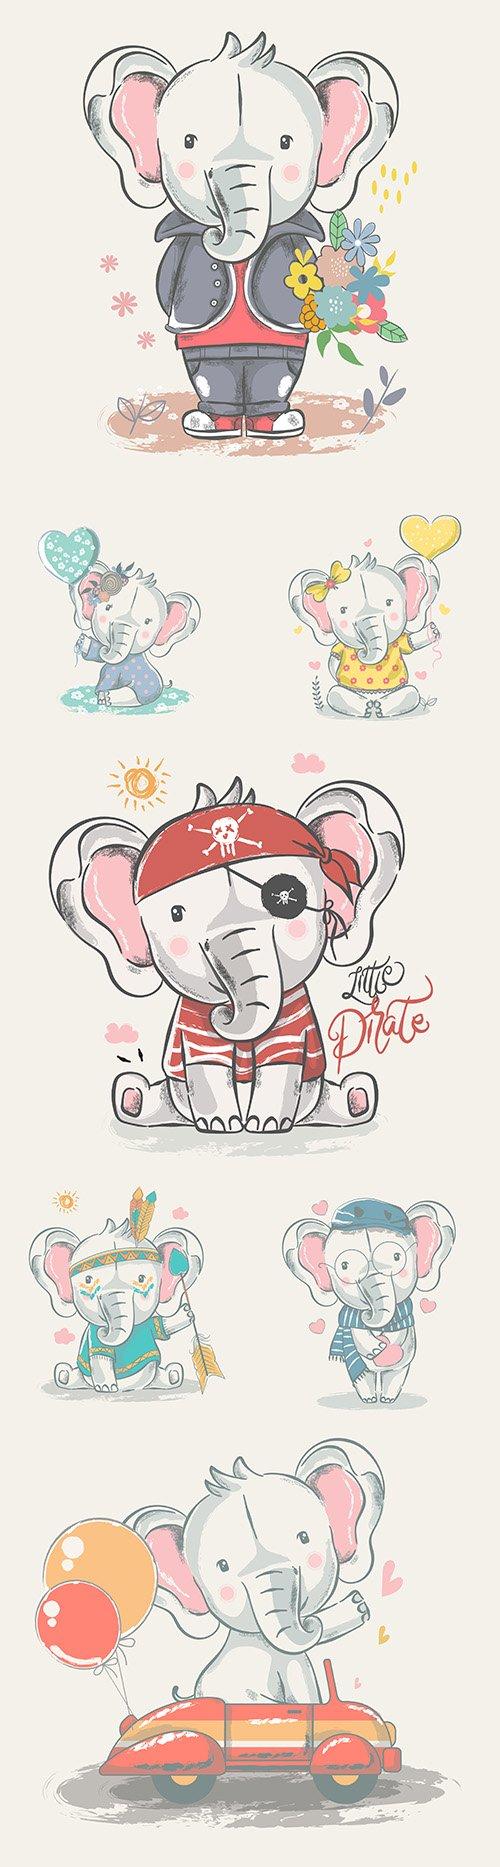 Cute elephant baby cartoon drawn illustrations